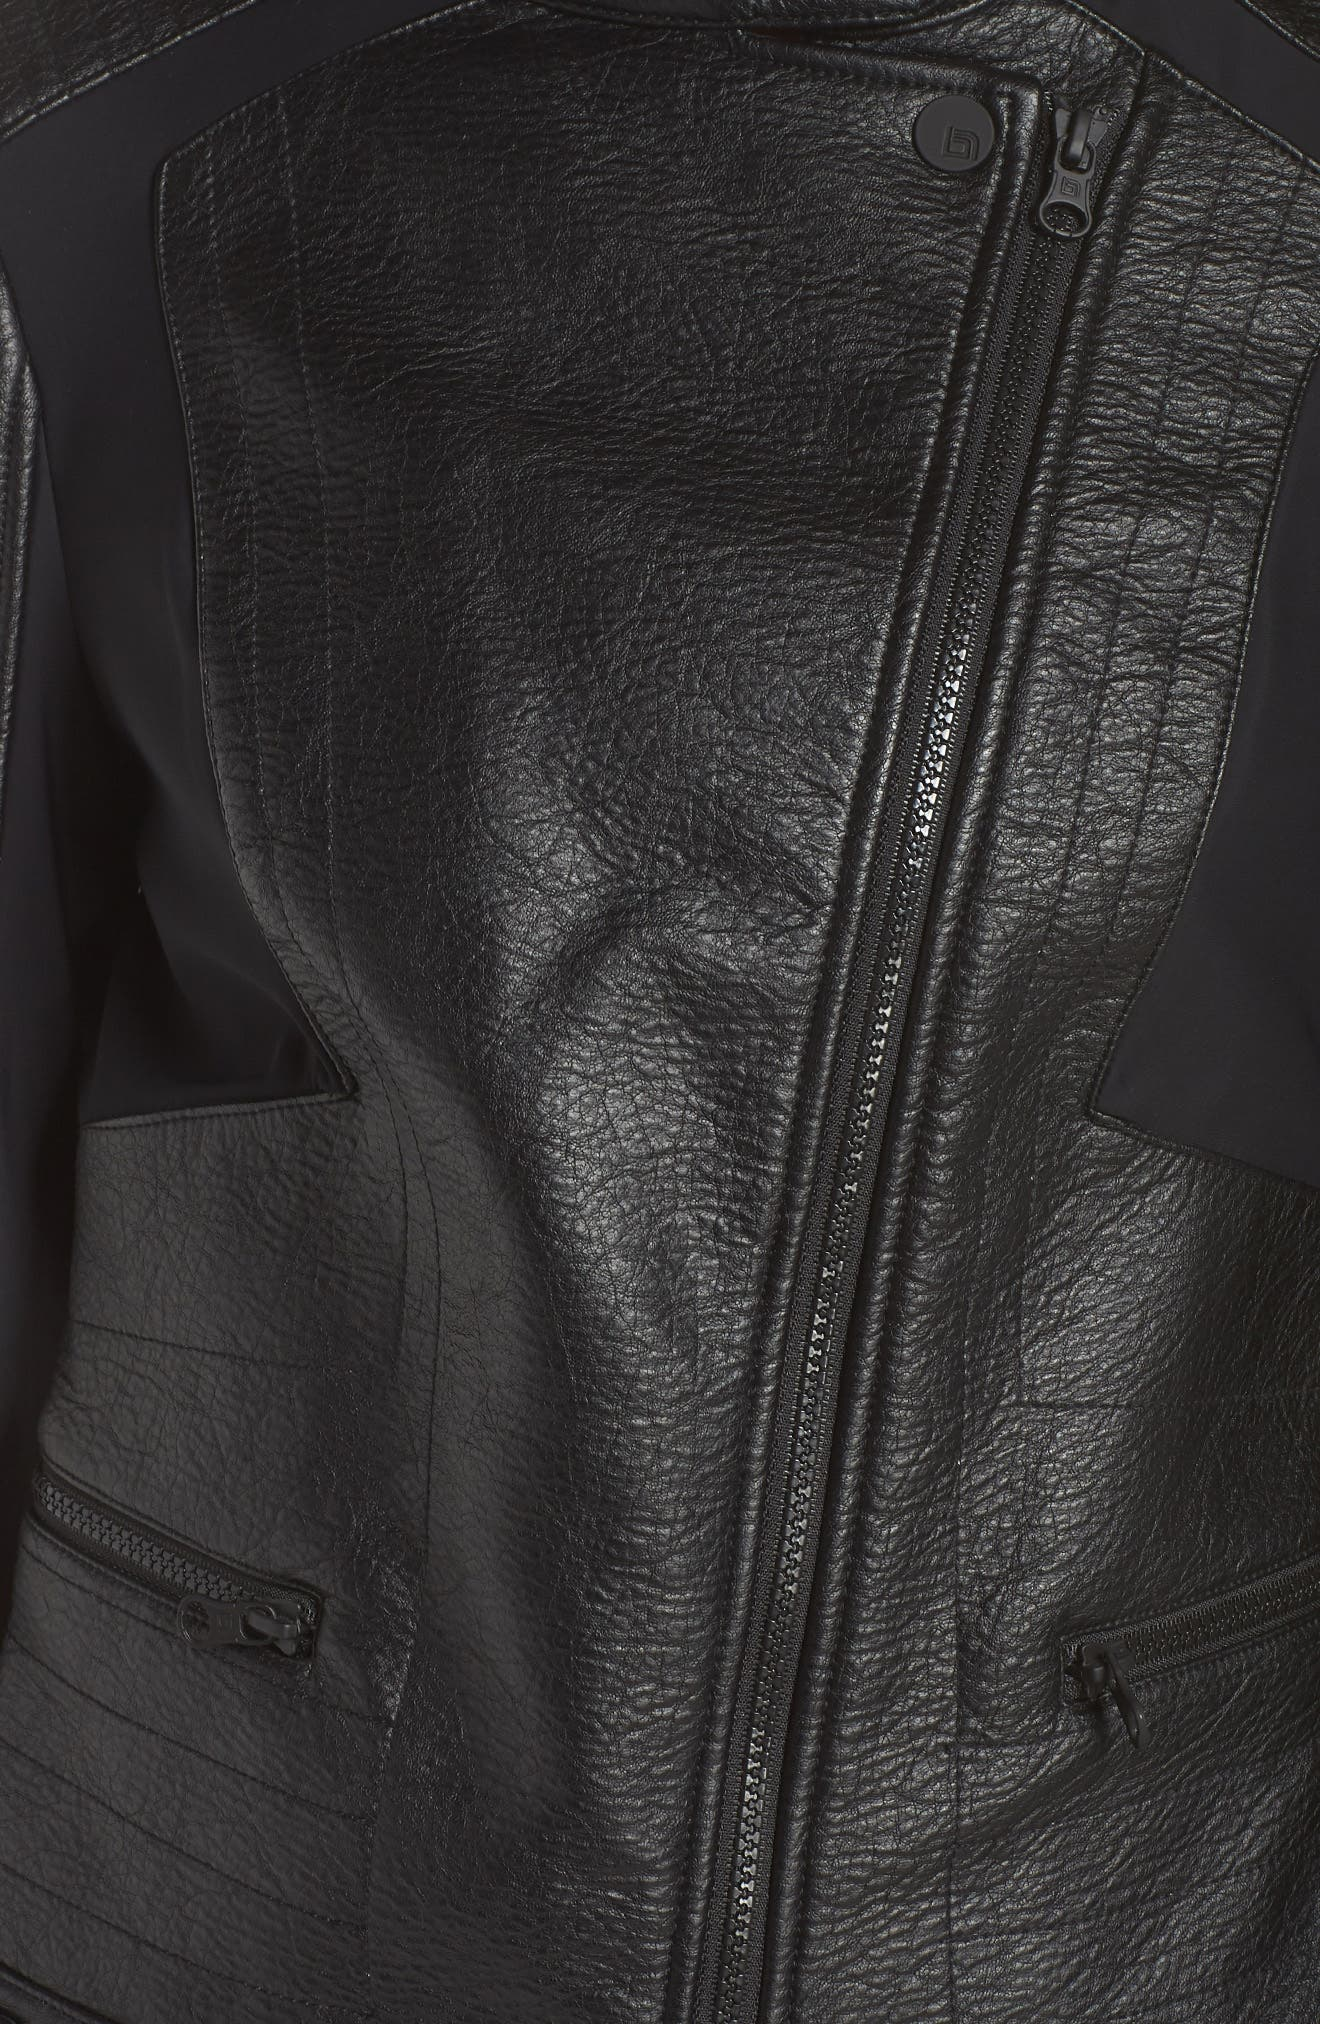 Ryder Faux Leather Moto Jacket,                             Alternate thumbnail 7, color,                             004